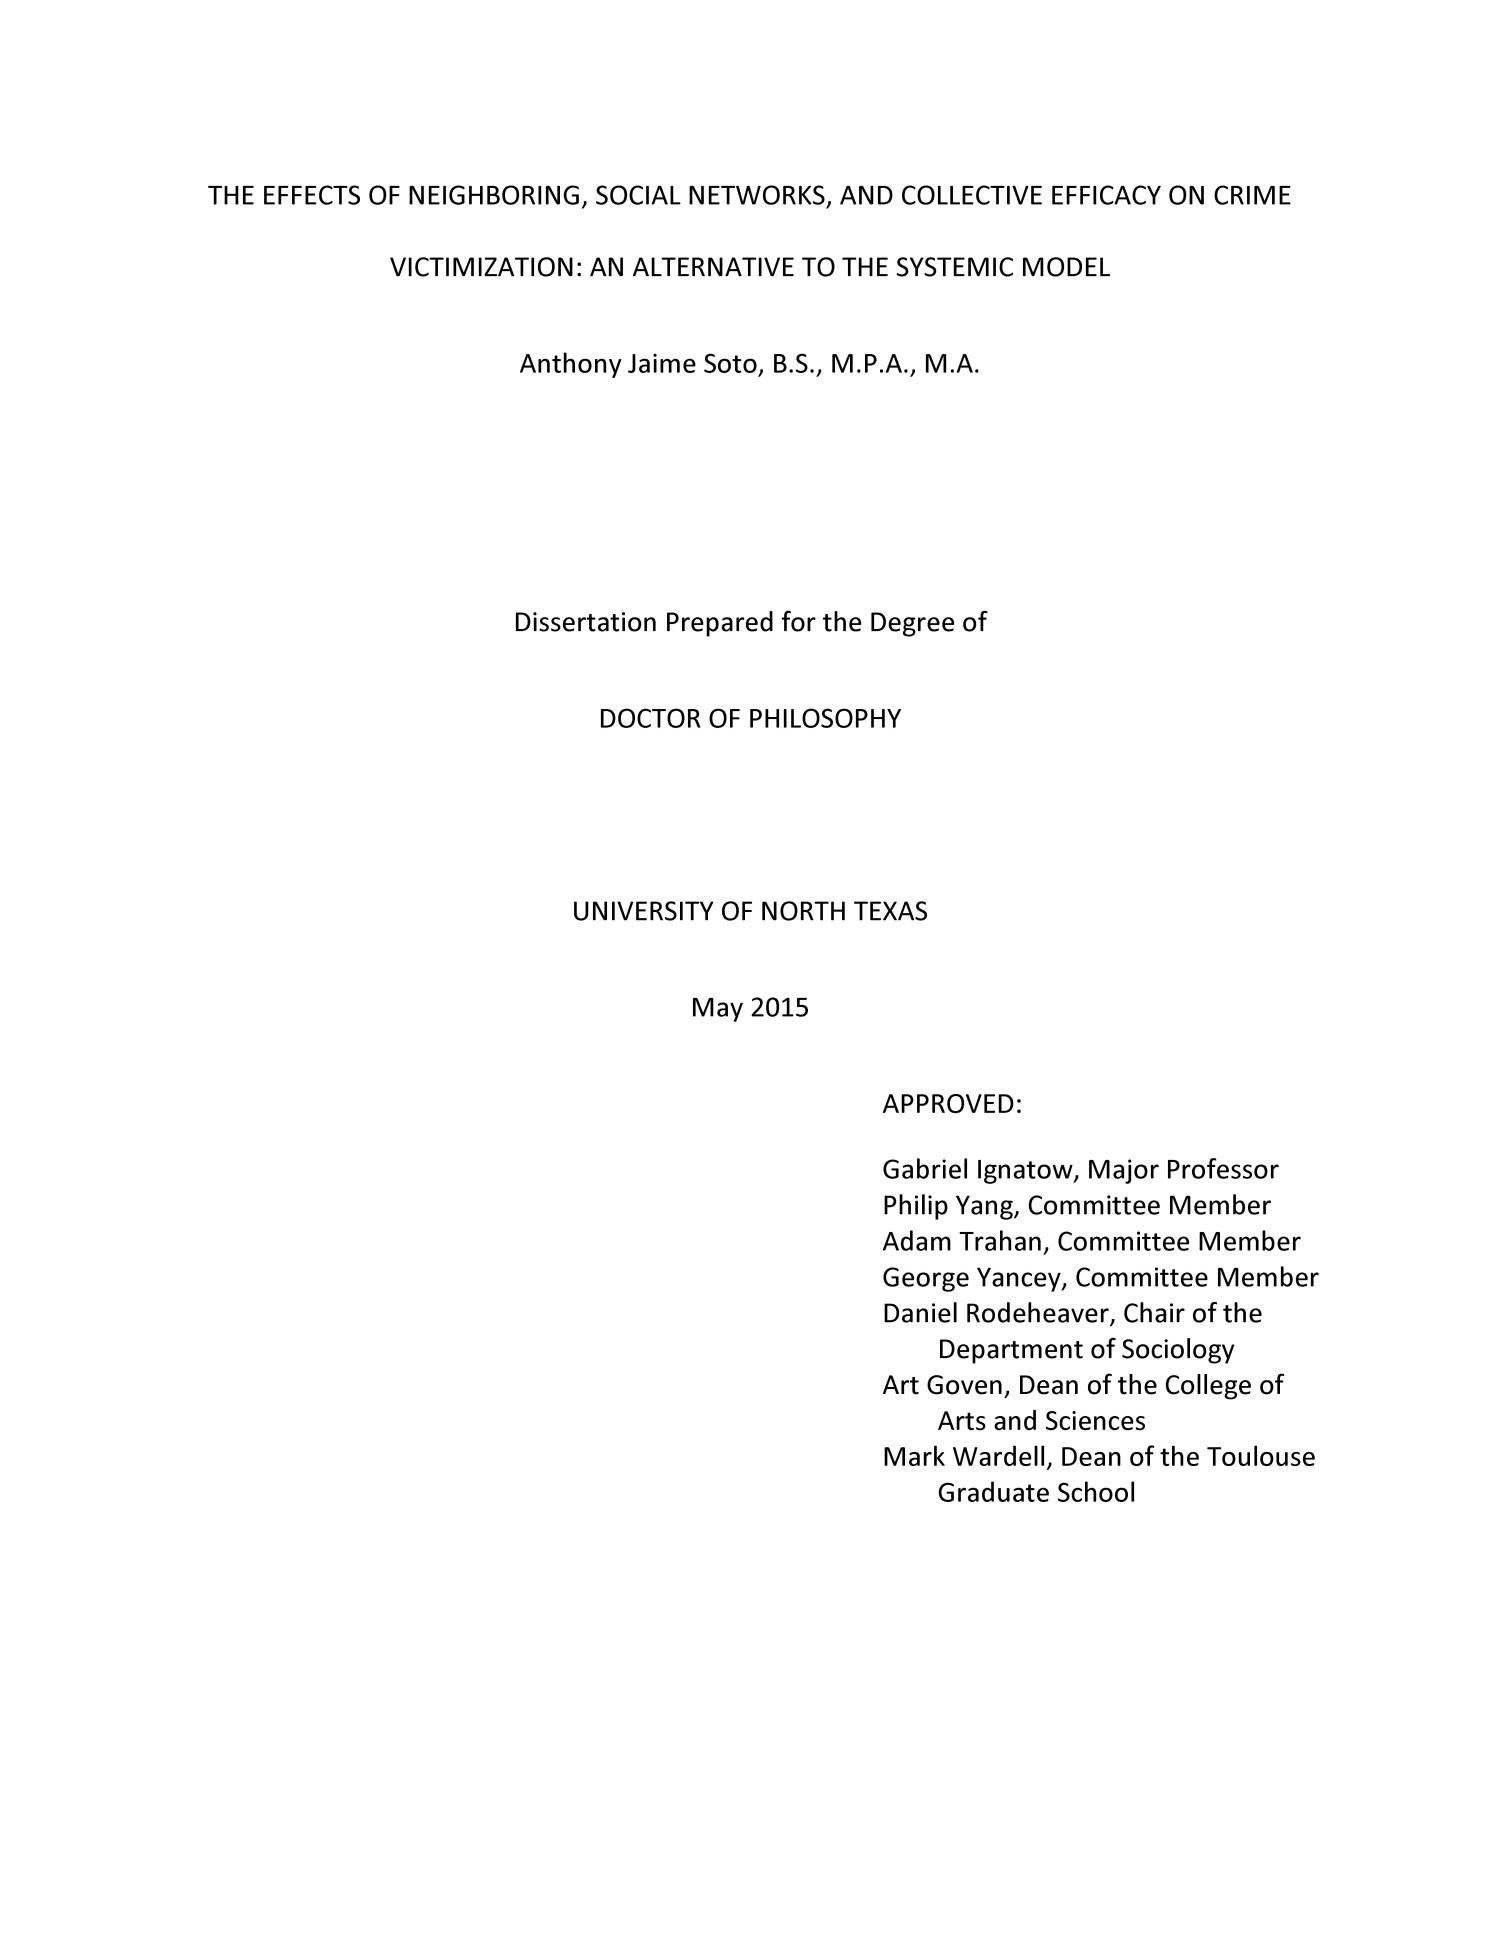 gabriel trahan dissertation